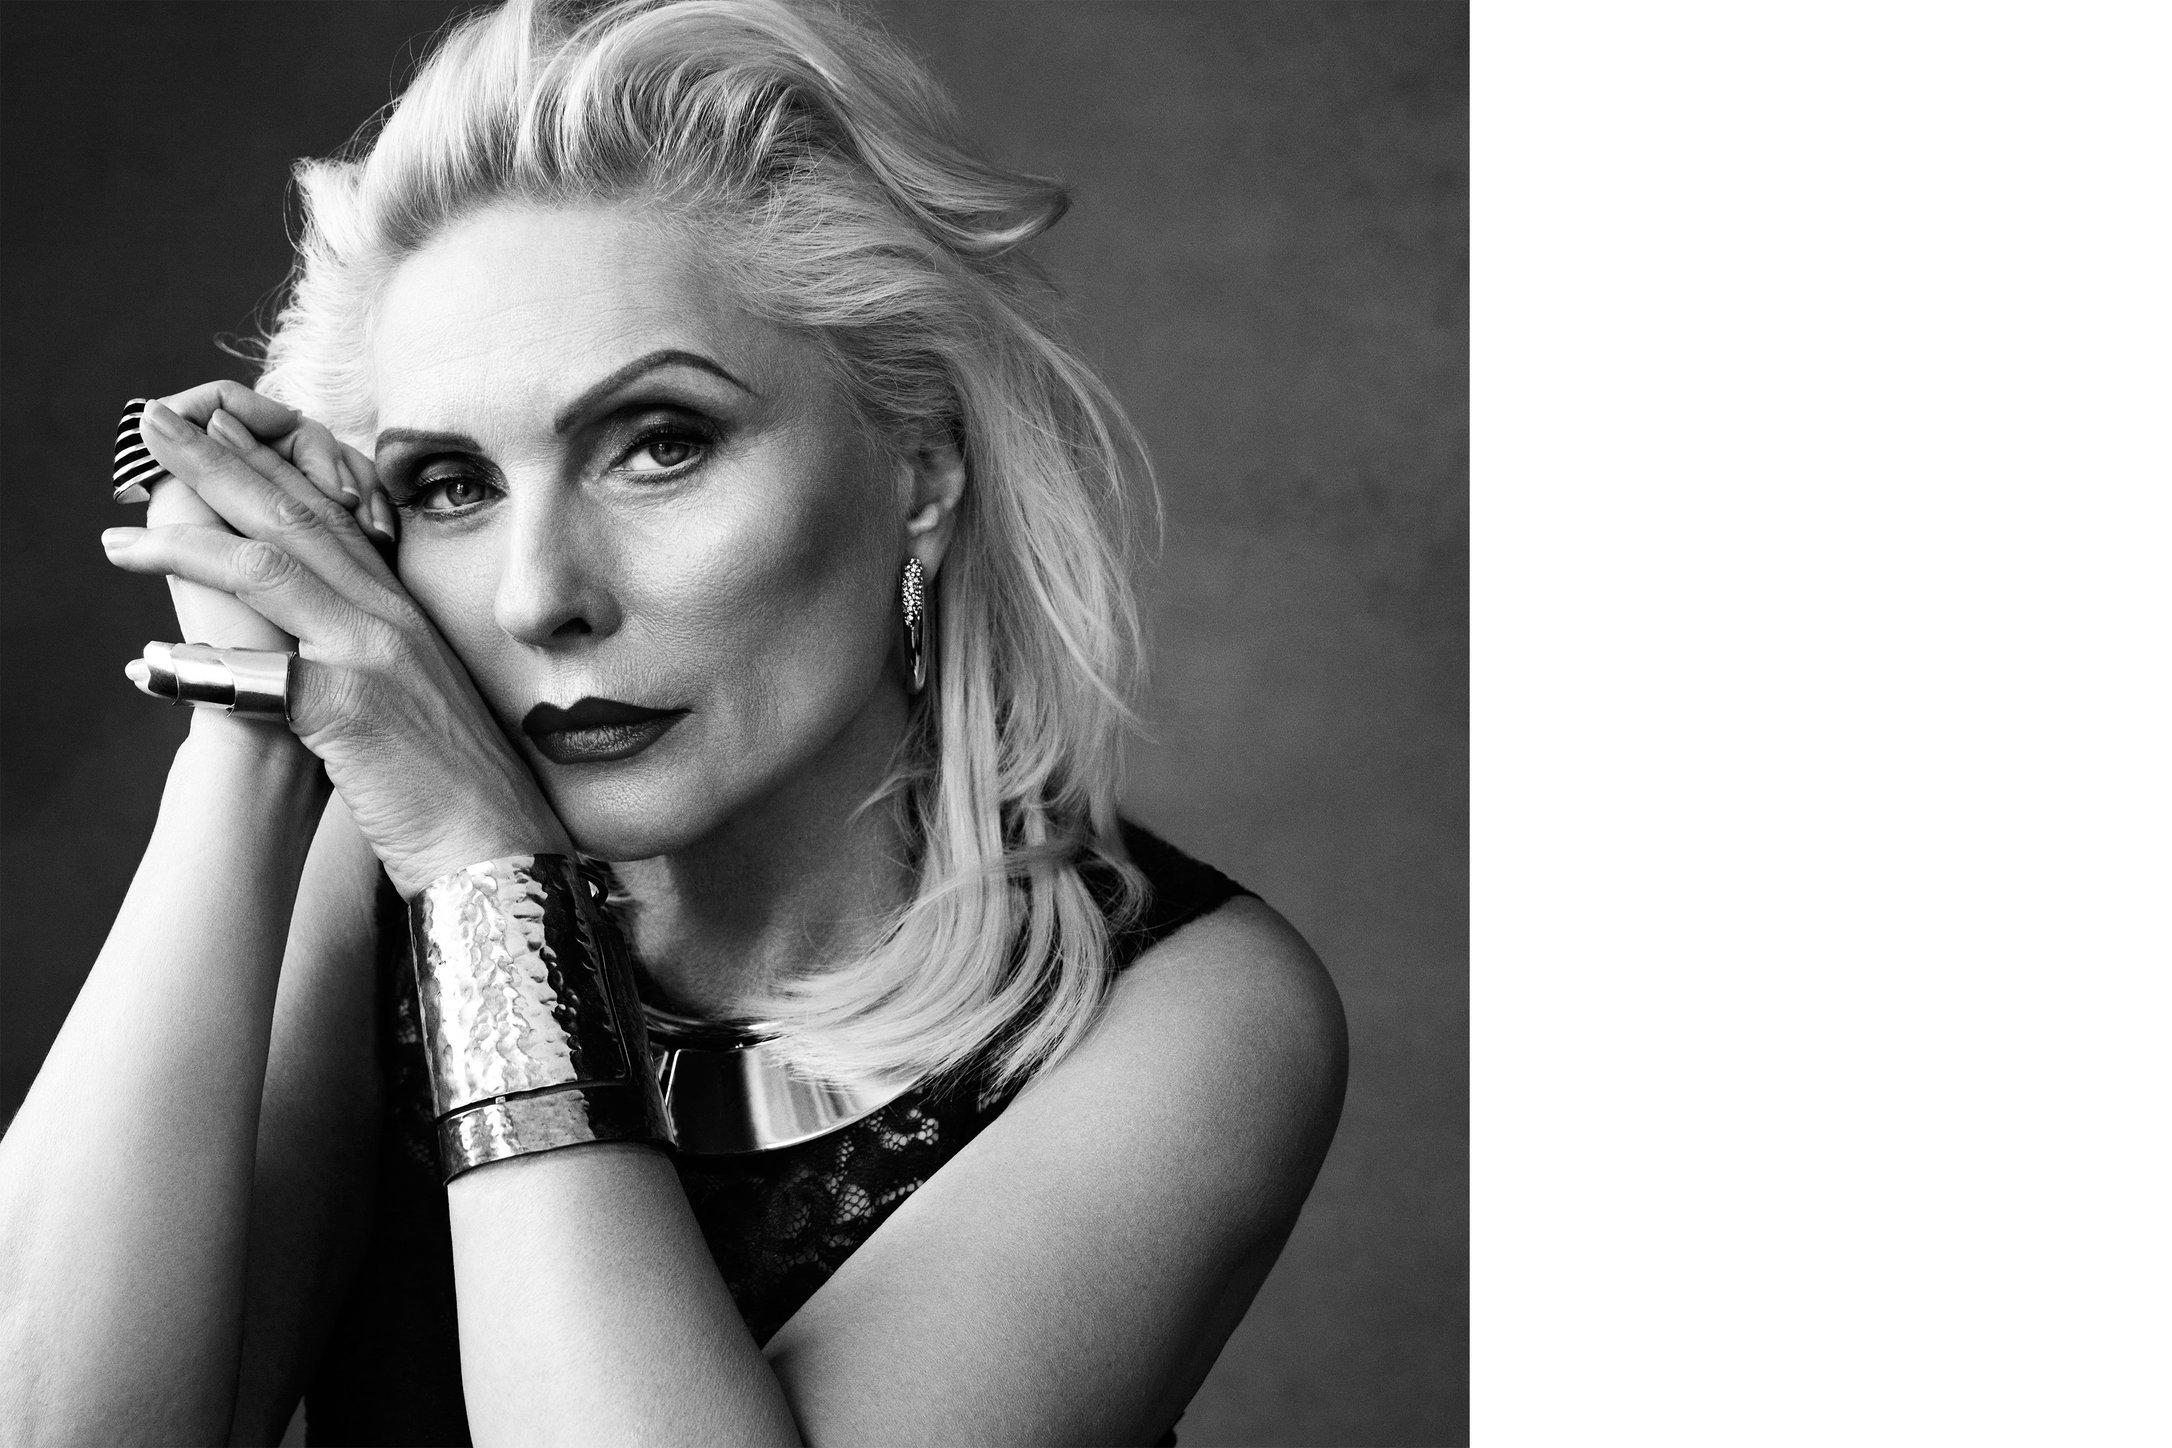 Vogue Spain. Debbie Harry. September 2013